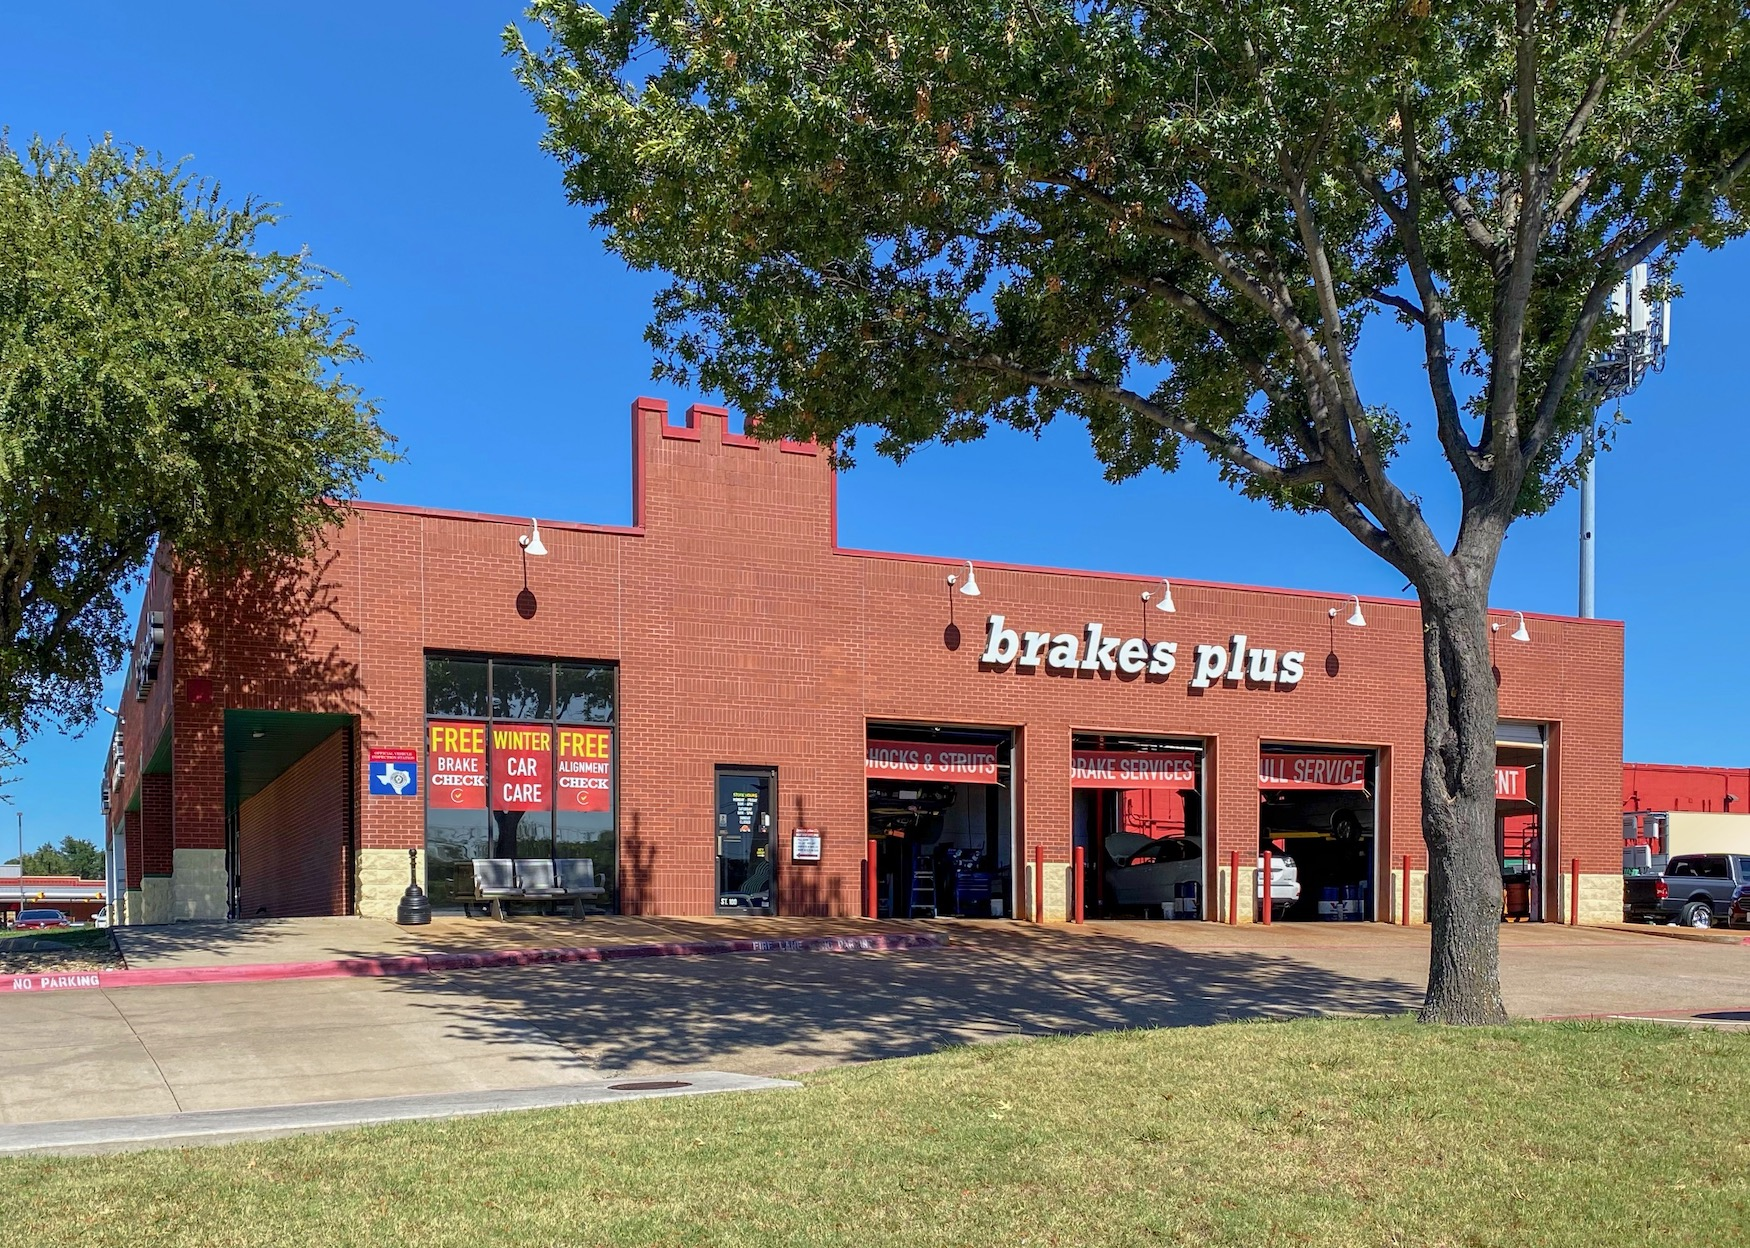 Brakes Plus at Plano, TX - Coit Road